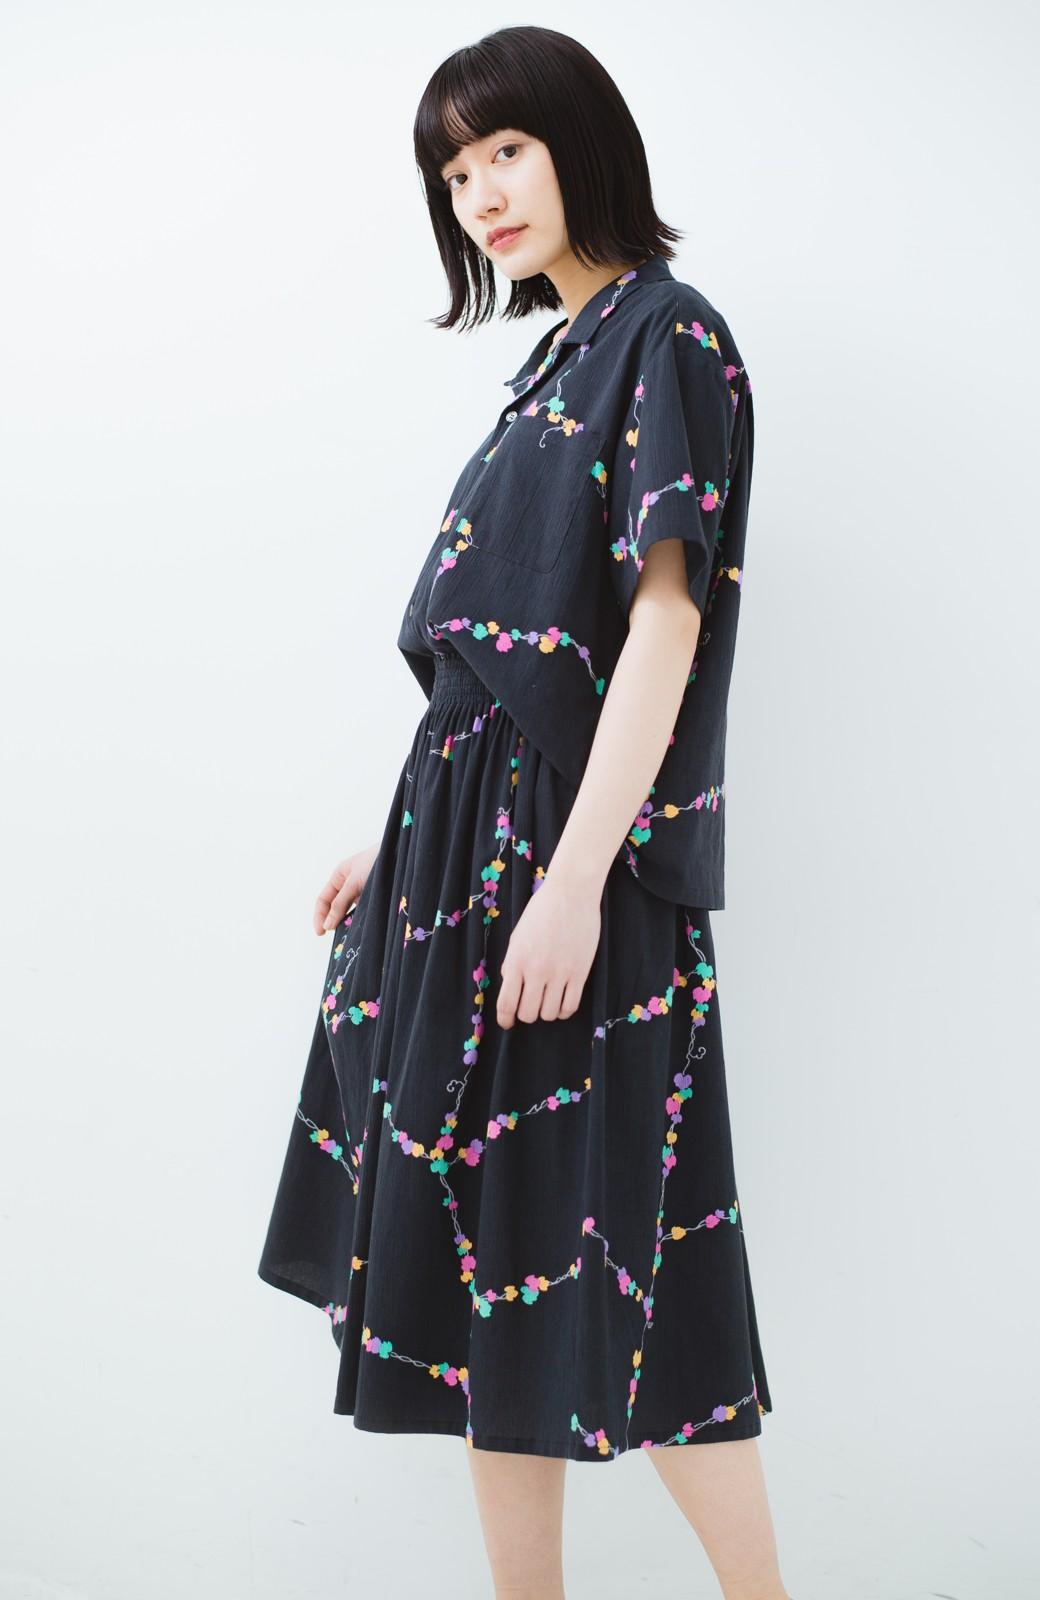 haco! 京都の浴衣屋さんと作った浴衣生地のスカート <ブラック系その他>の商品写真20